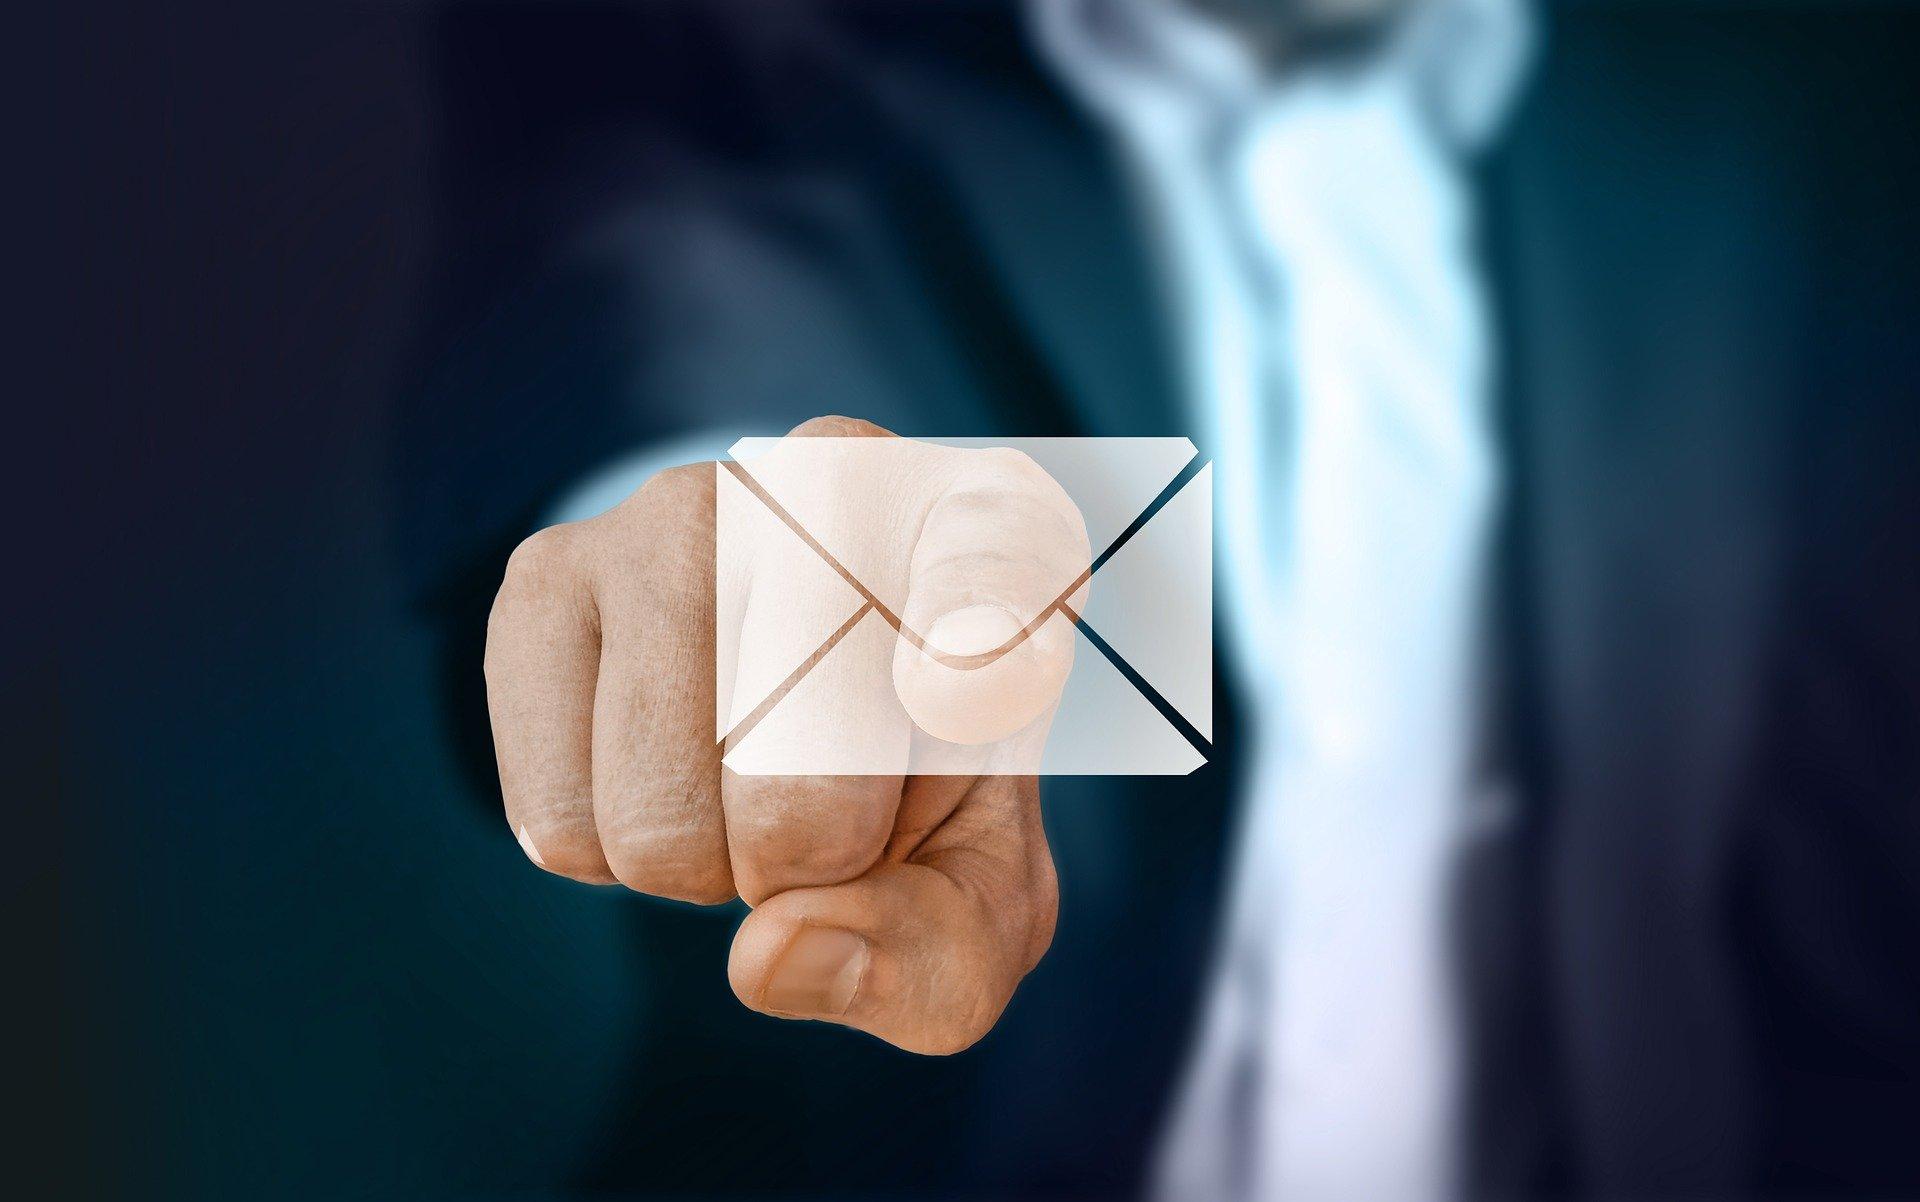 /UserFiles/File/Annuaire/annuaire_portails/busi/businessman-29569741920.jpg